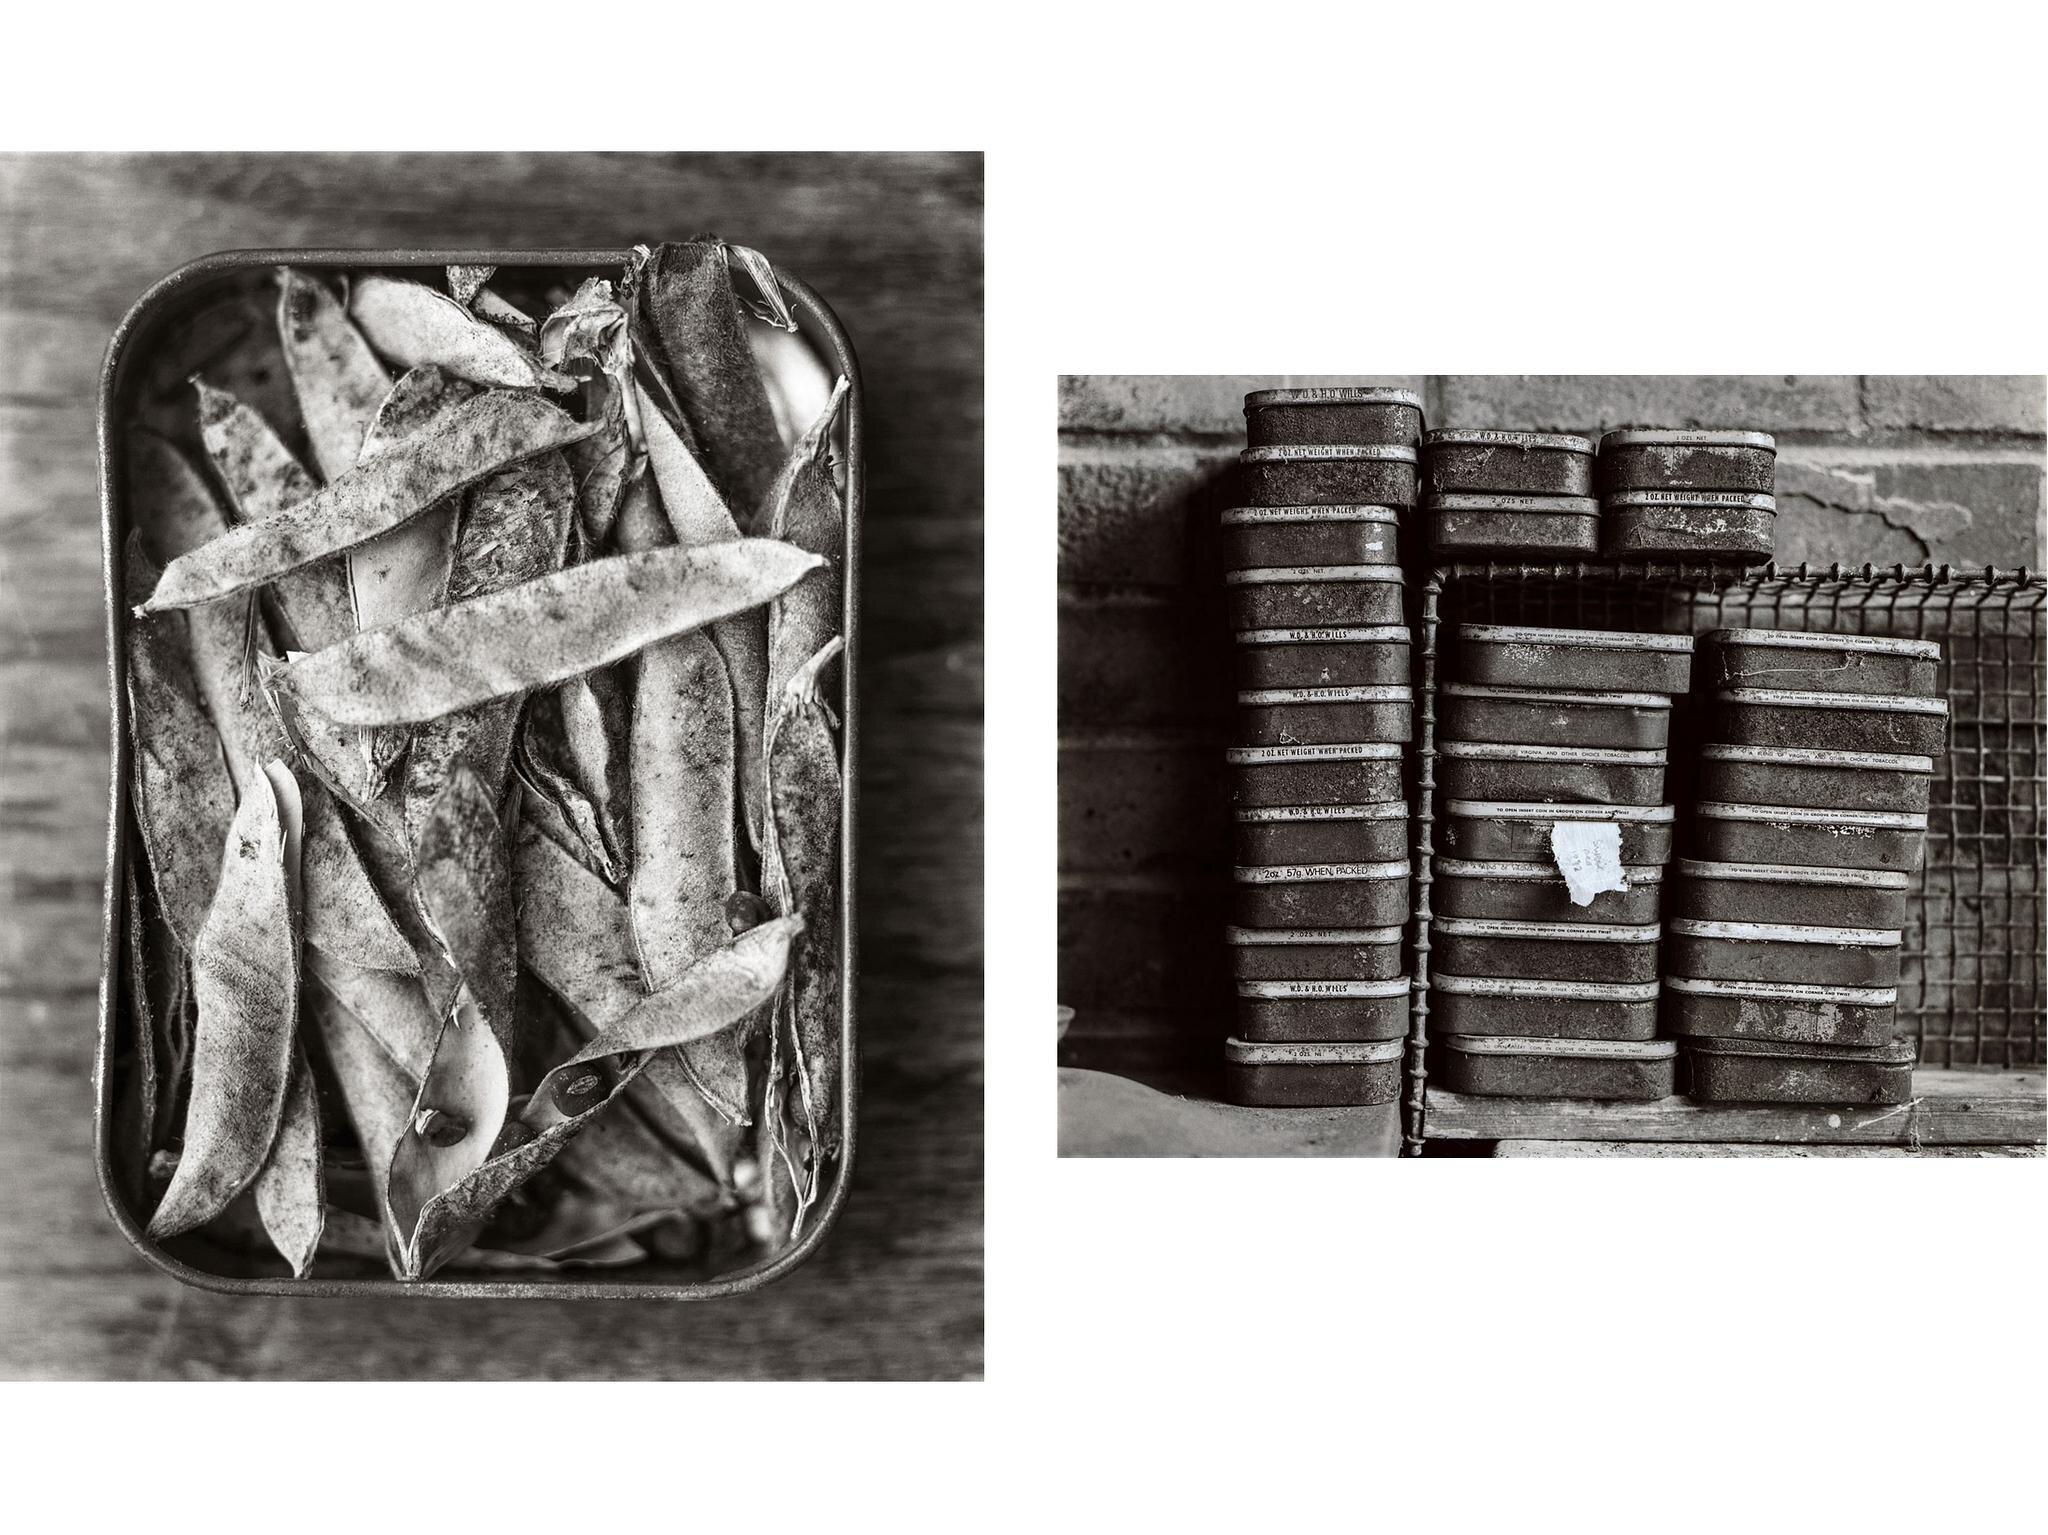 Julian-Ward-Tabacco-Tins.jpg